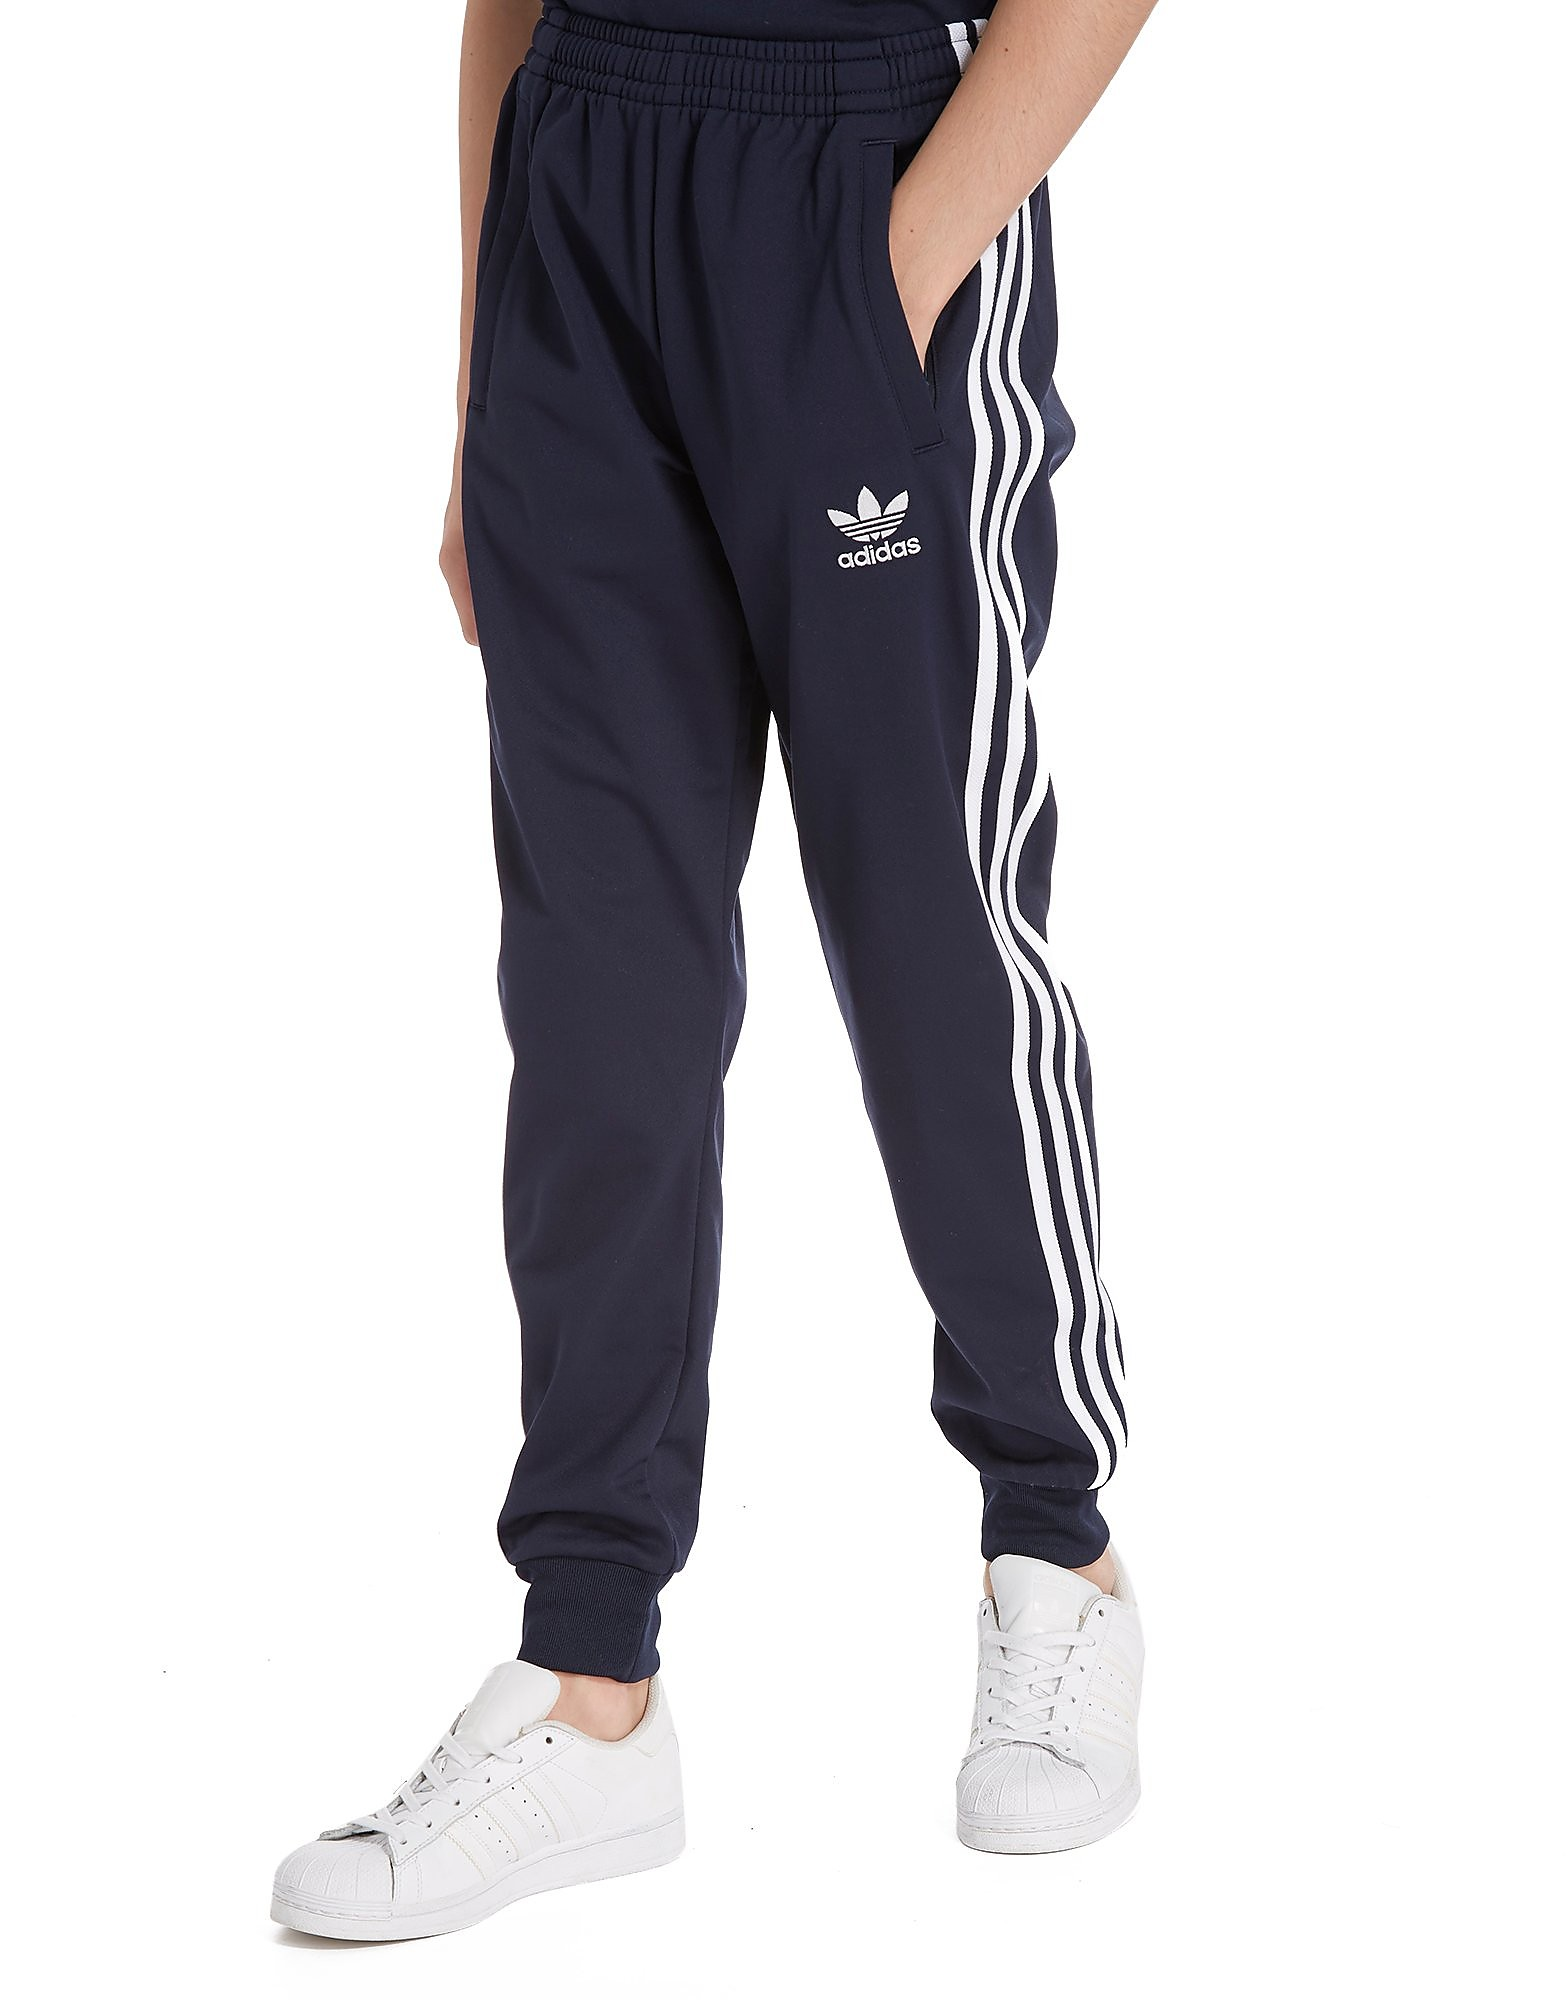 adidas Originals Superstar Pants Junior